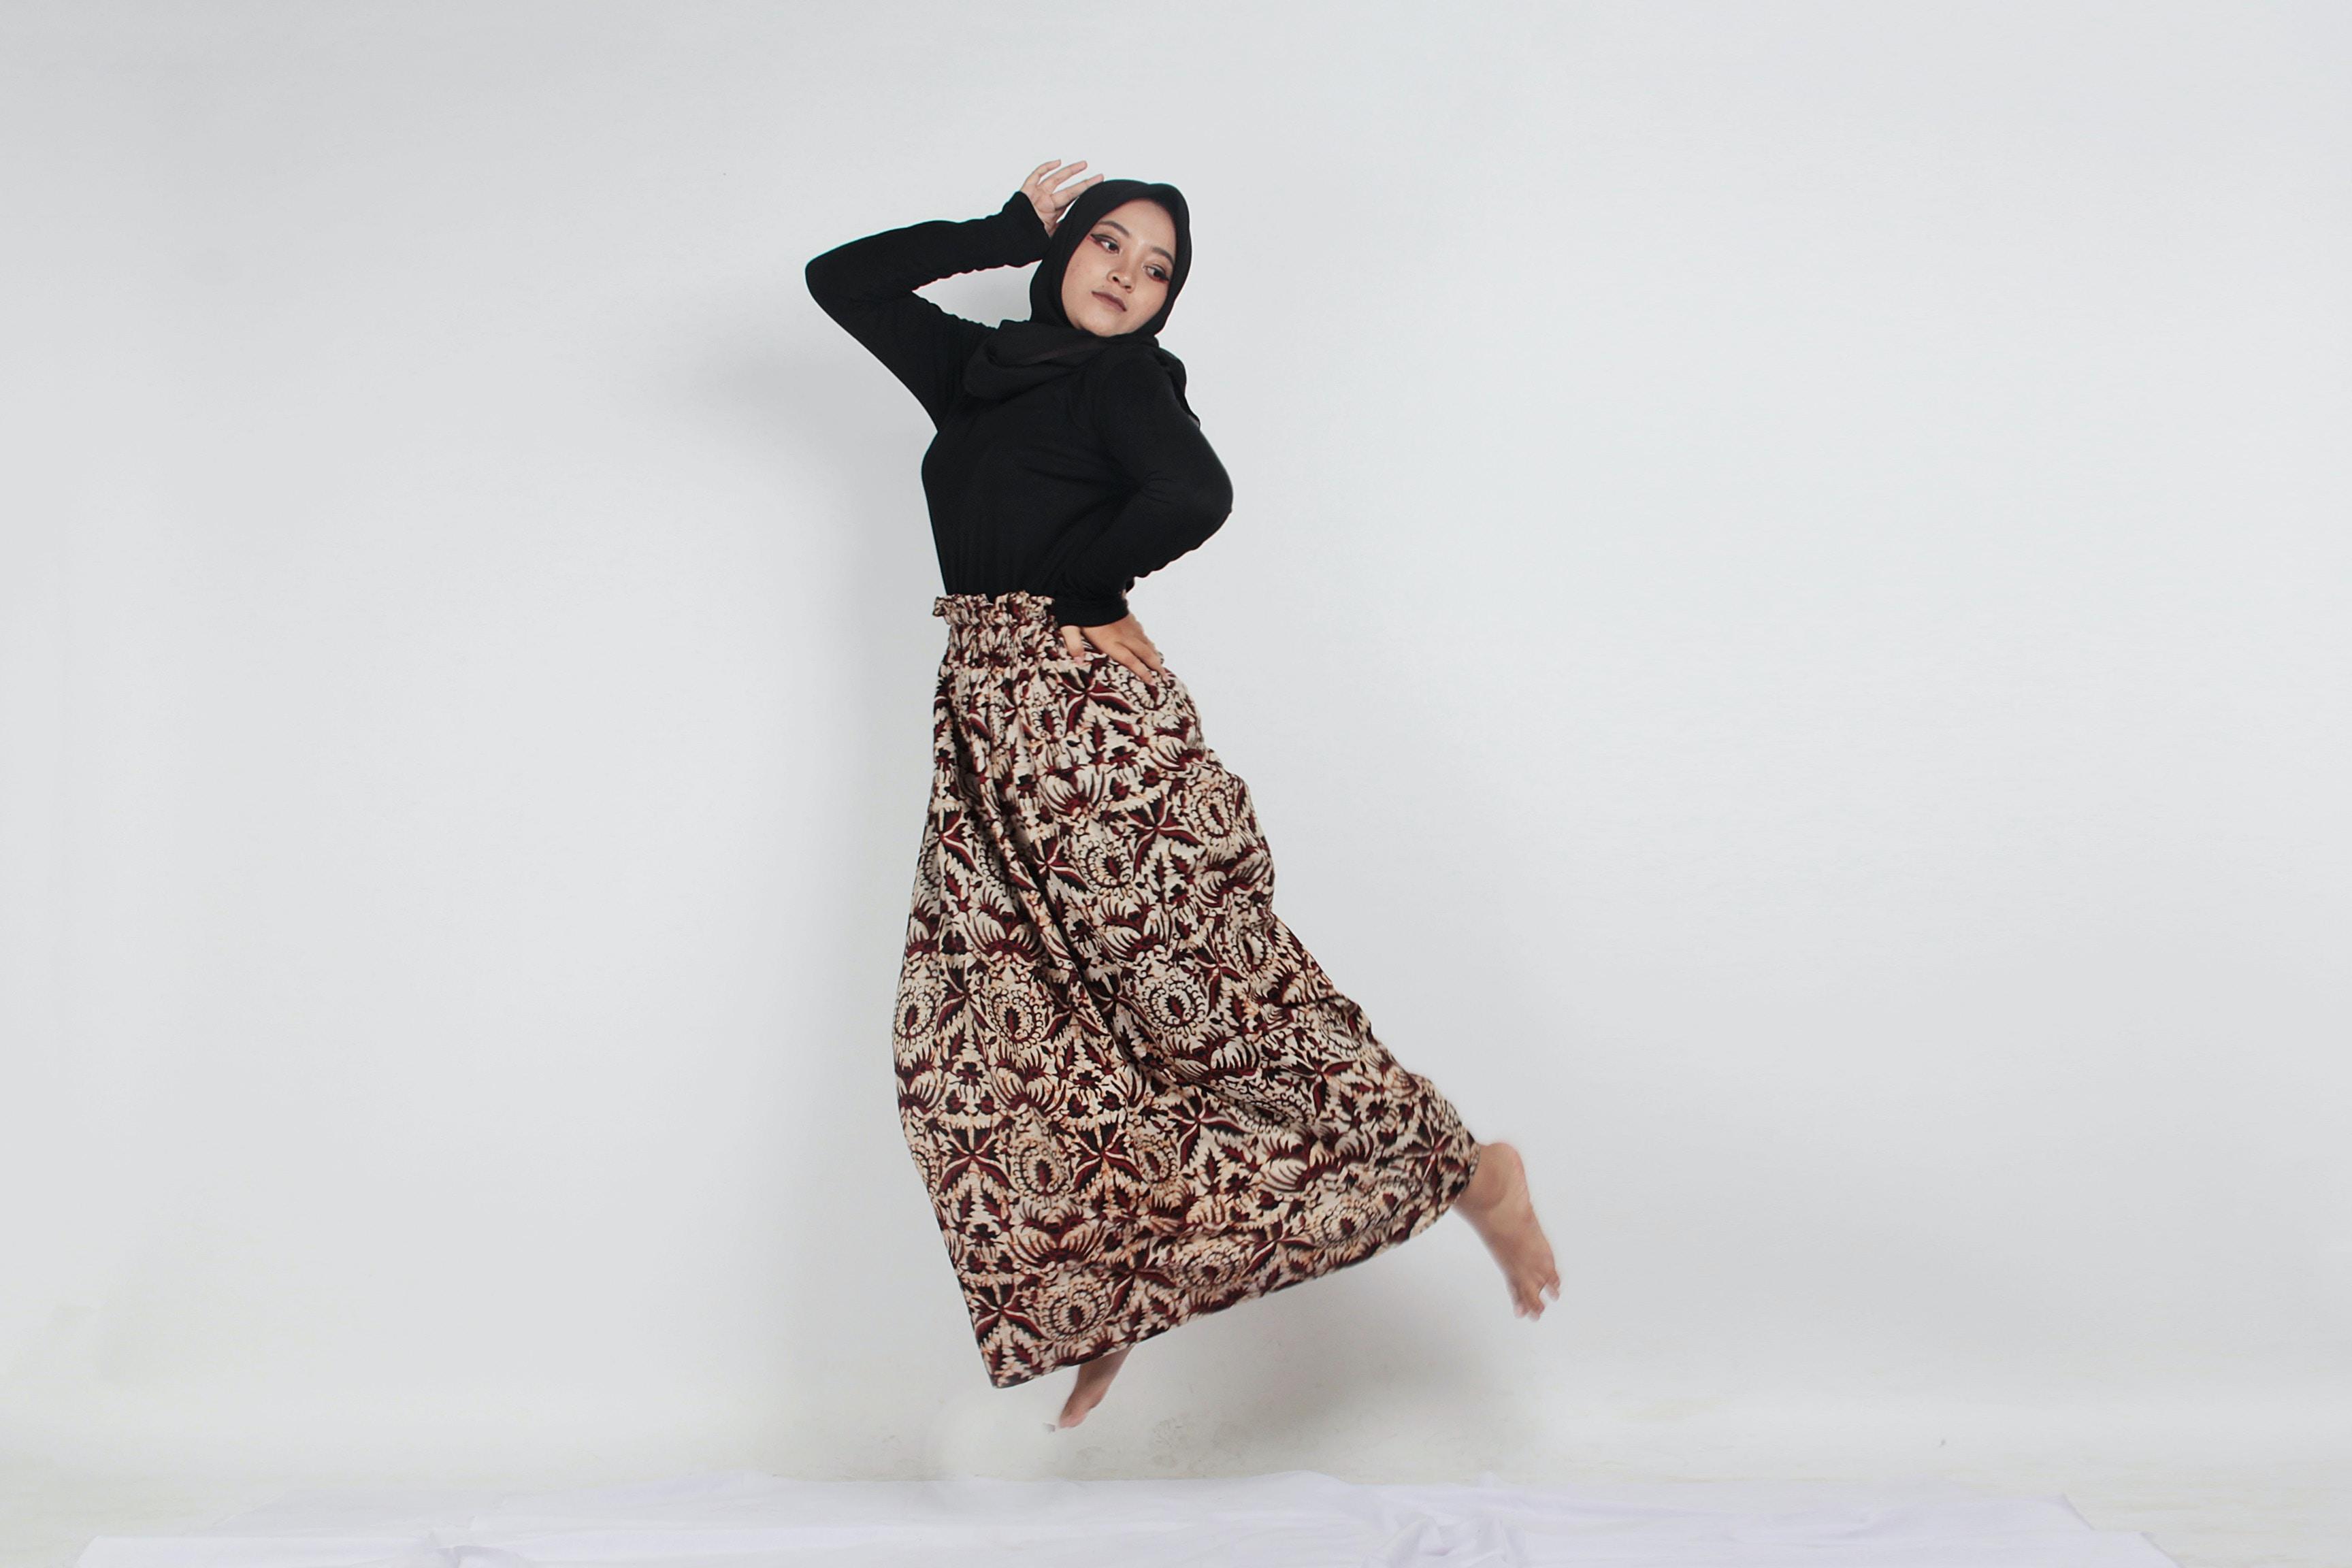 woman wearing black hijab doing jump shot